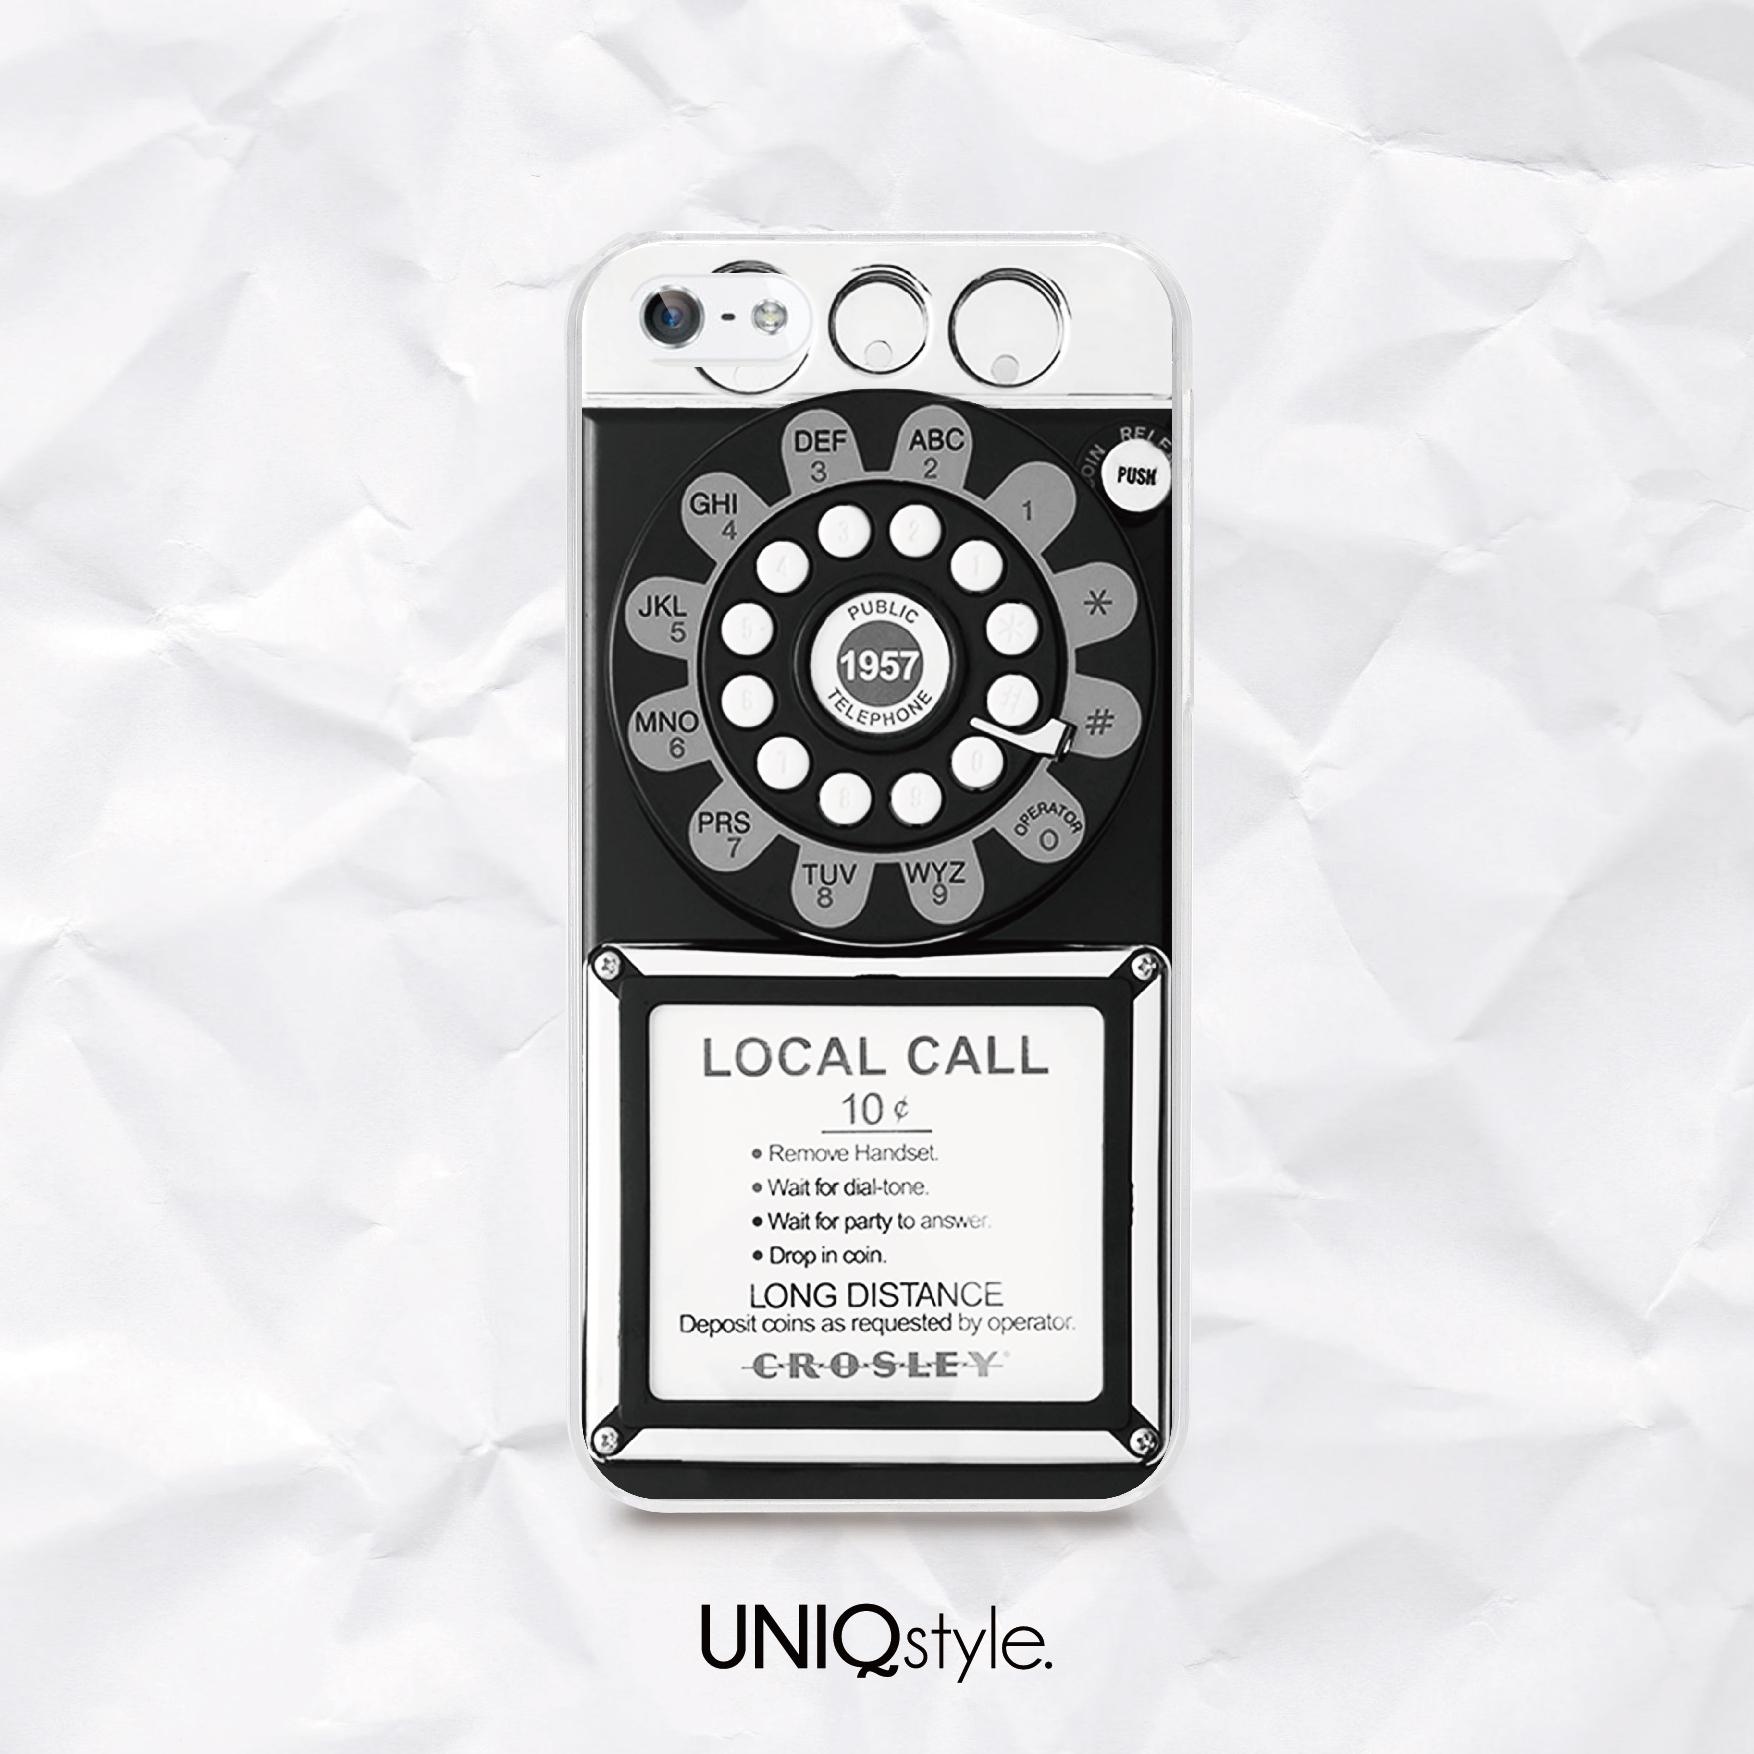 Sfondi Natalizi Nokia Lumia 520.Vintage Retro Payphone Phone Case For Iphone 6 6s Iphone 5 5s 5c Samsung S5 S6 Note5 Sony Lg Nexus Nokia Lumia Htc One Moto X Moto G A22